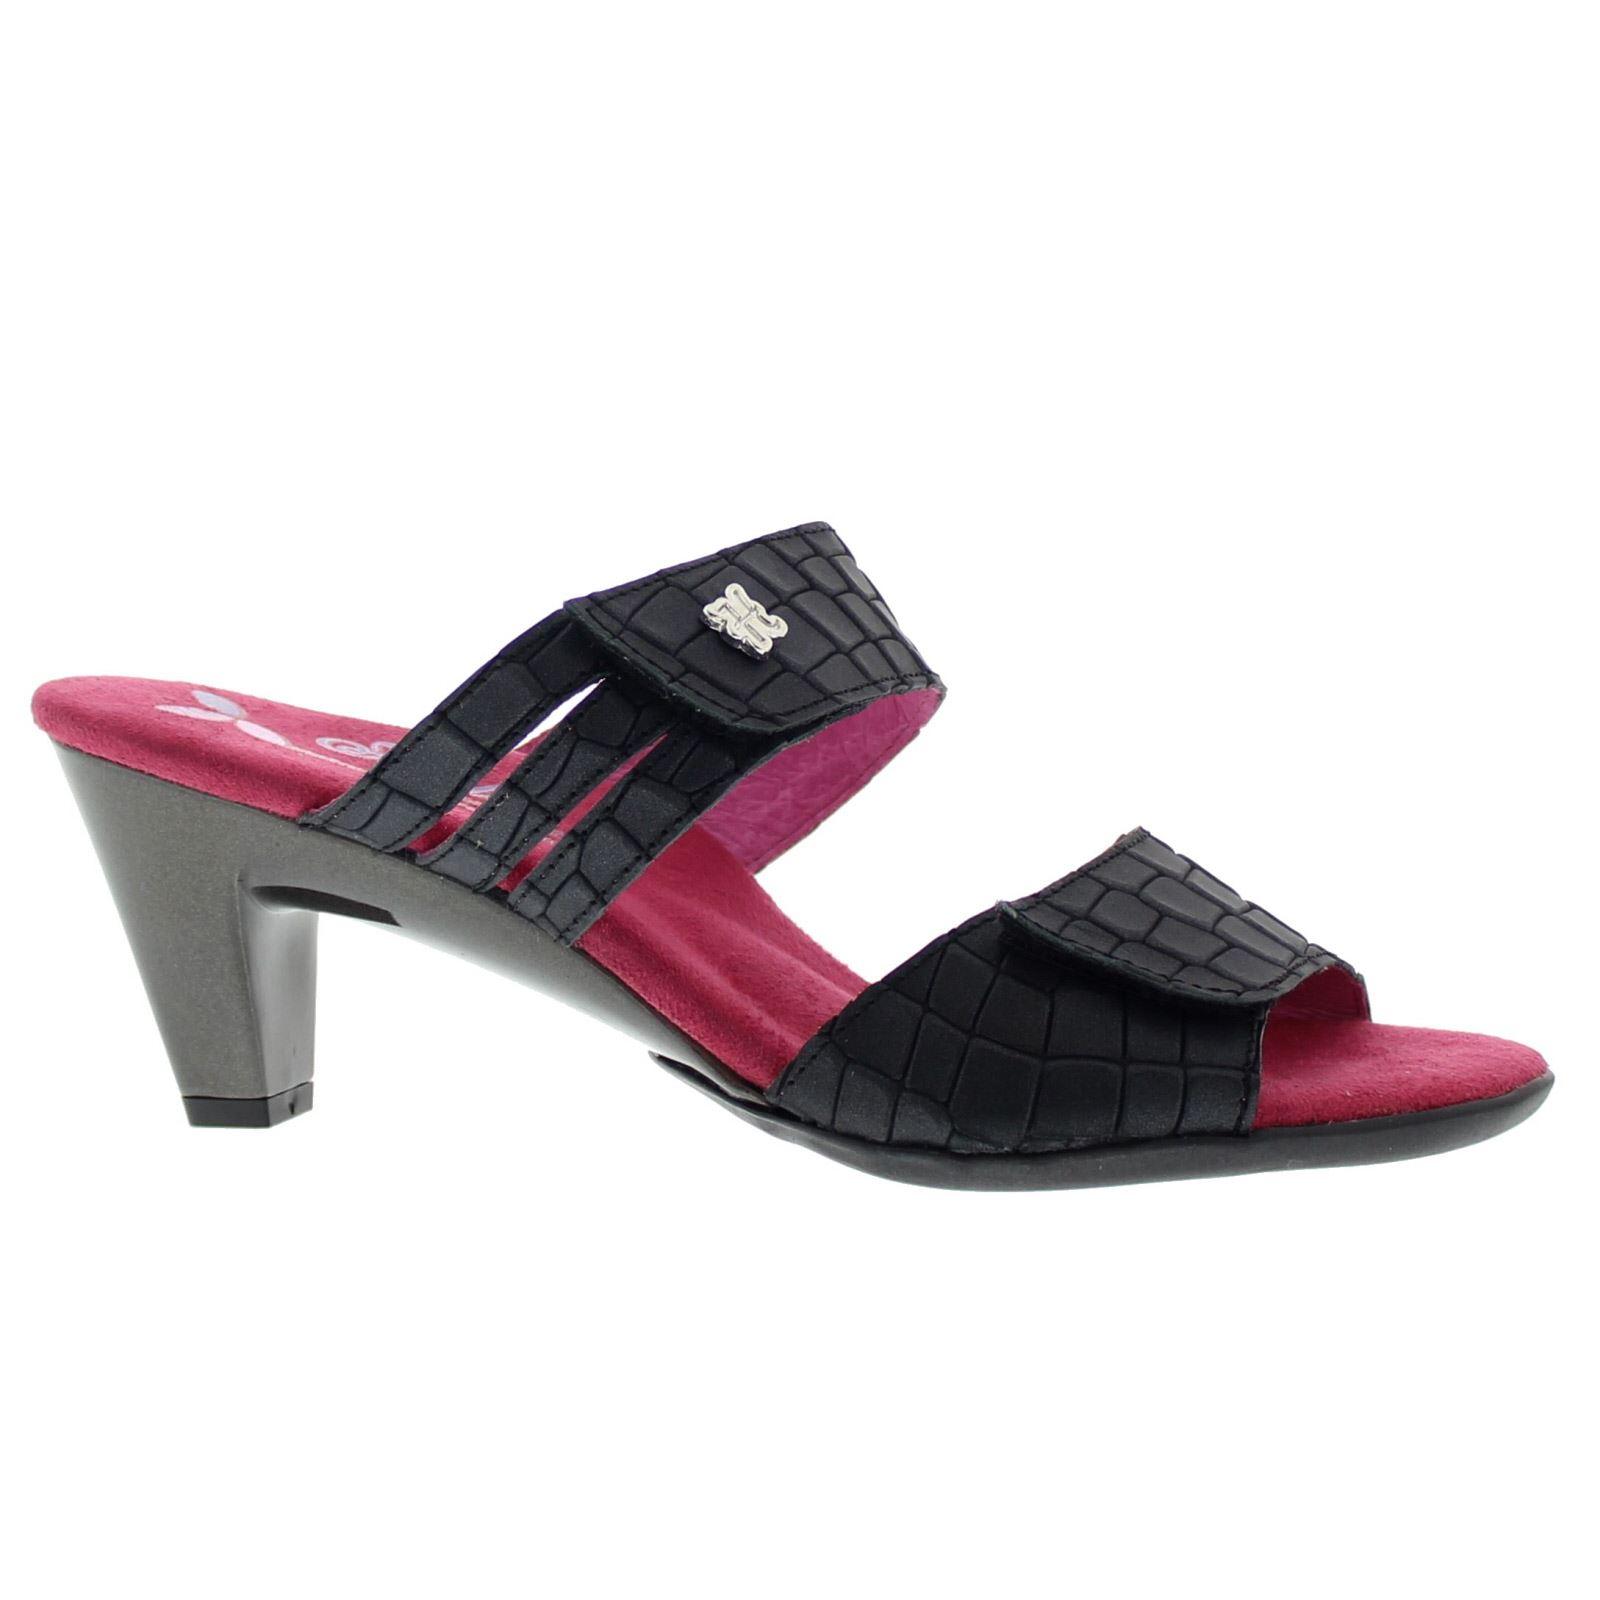 helle womens women black canada factory p comforter slide discount panoria sandals shoes price comfort s